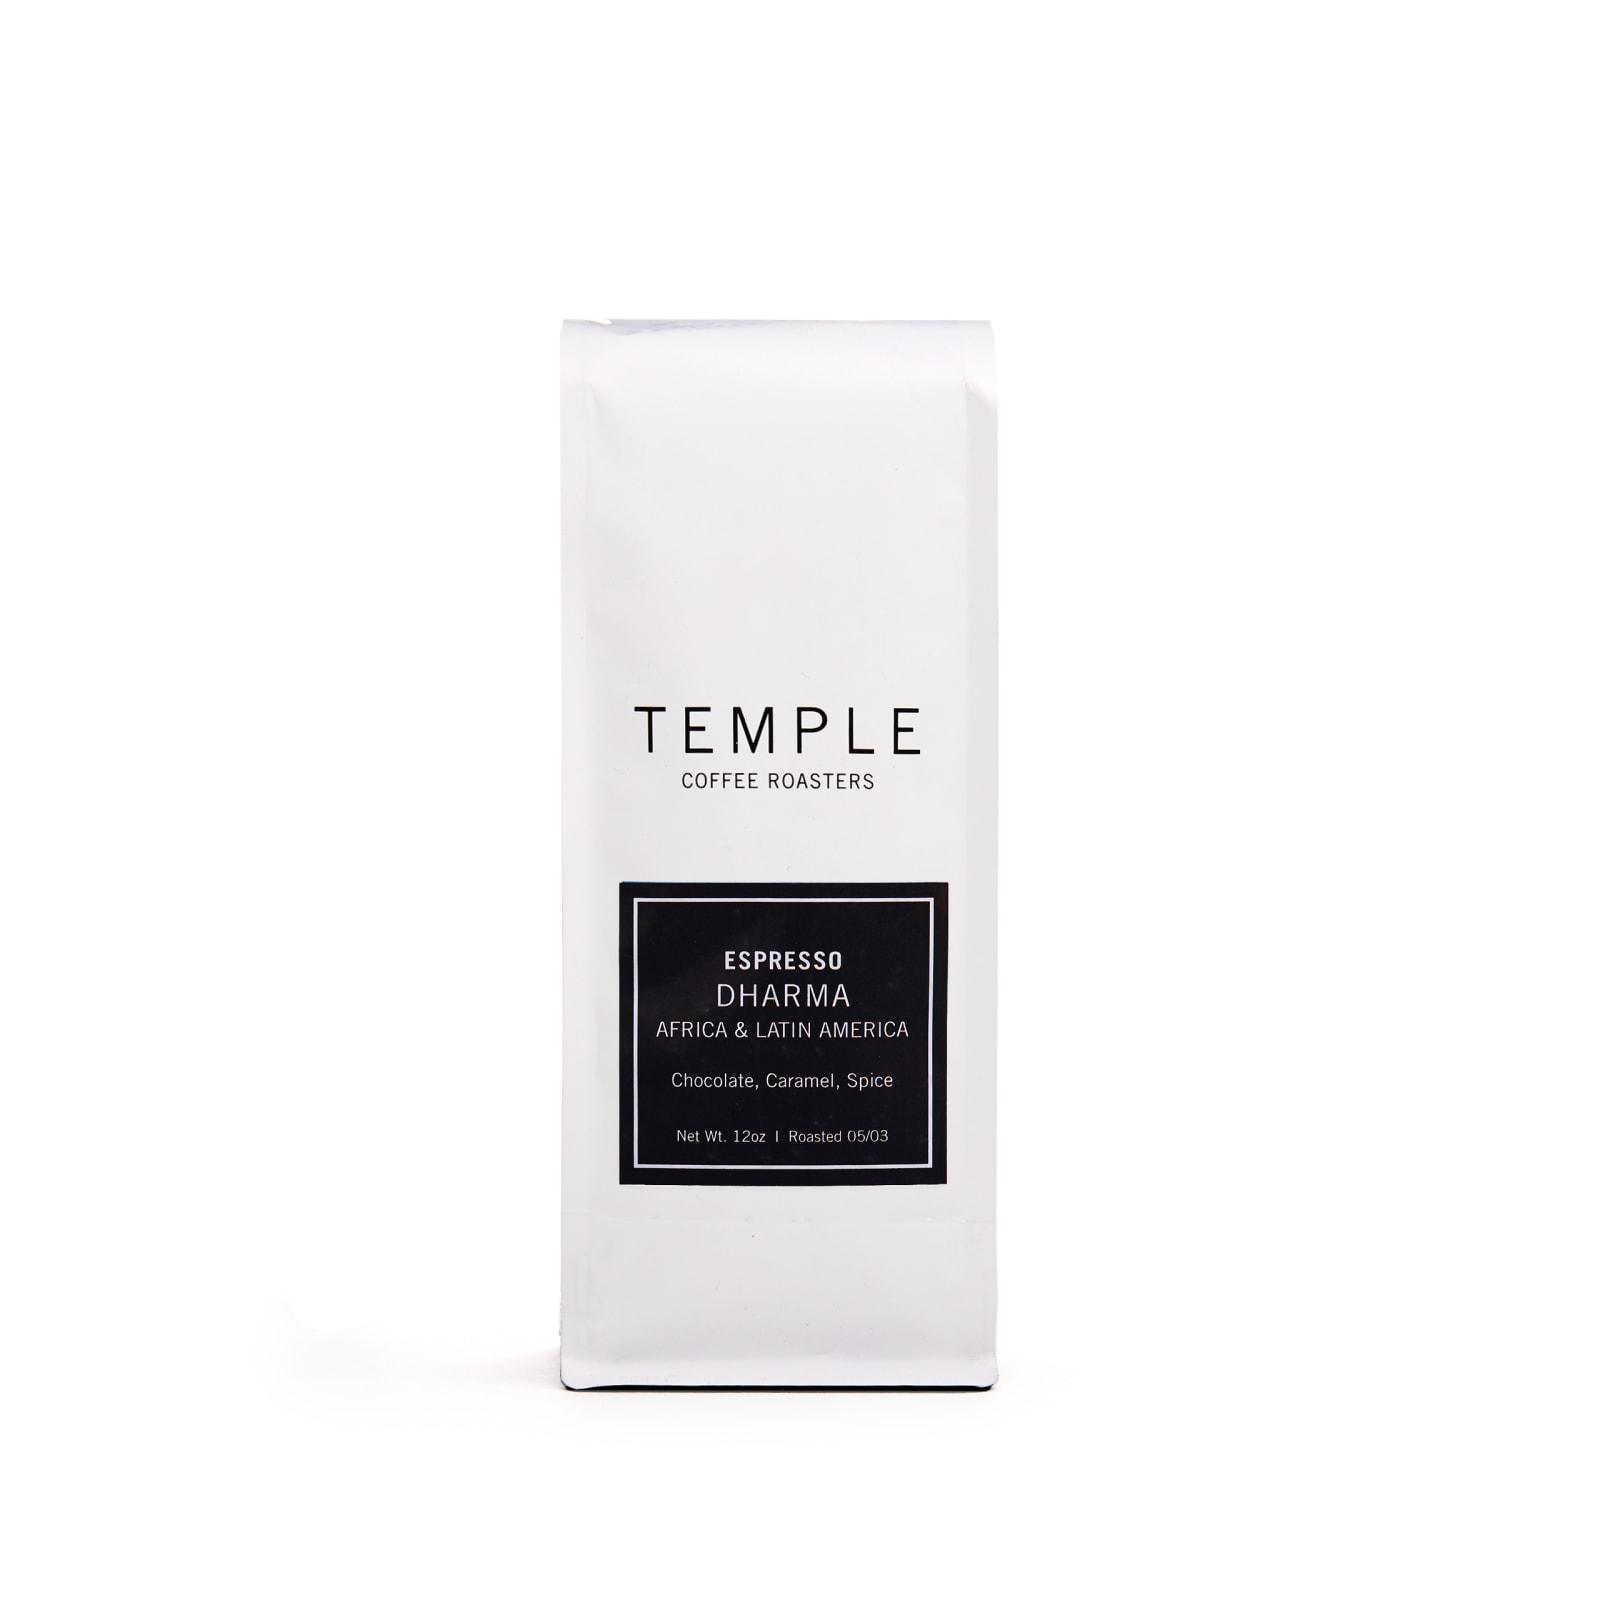 Dharma Espresso - 5 lb bag